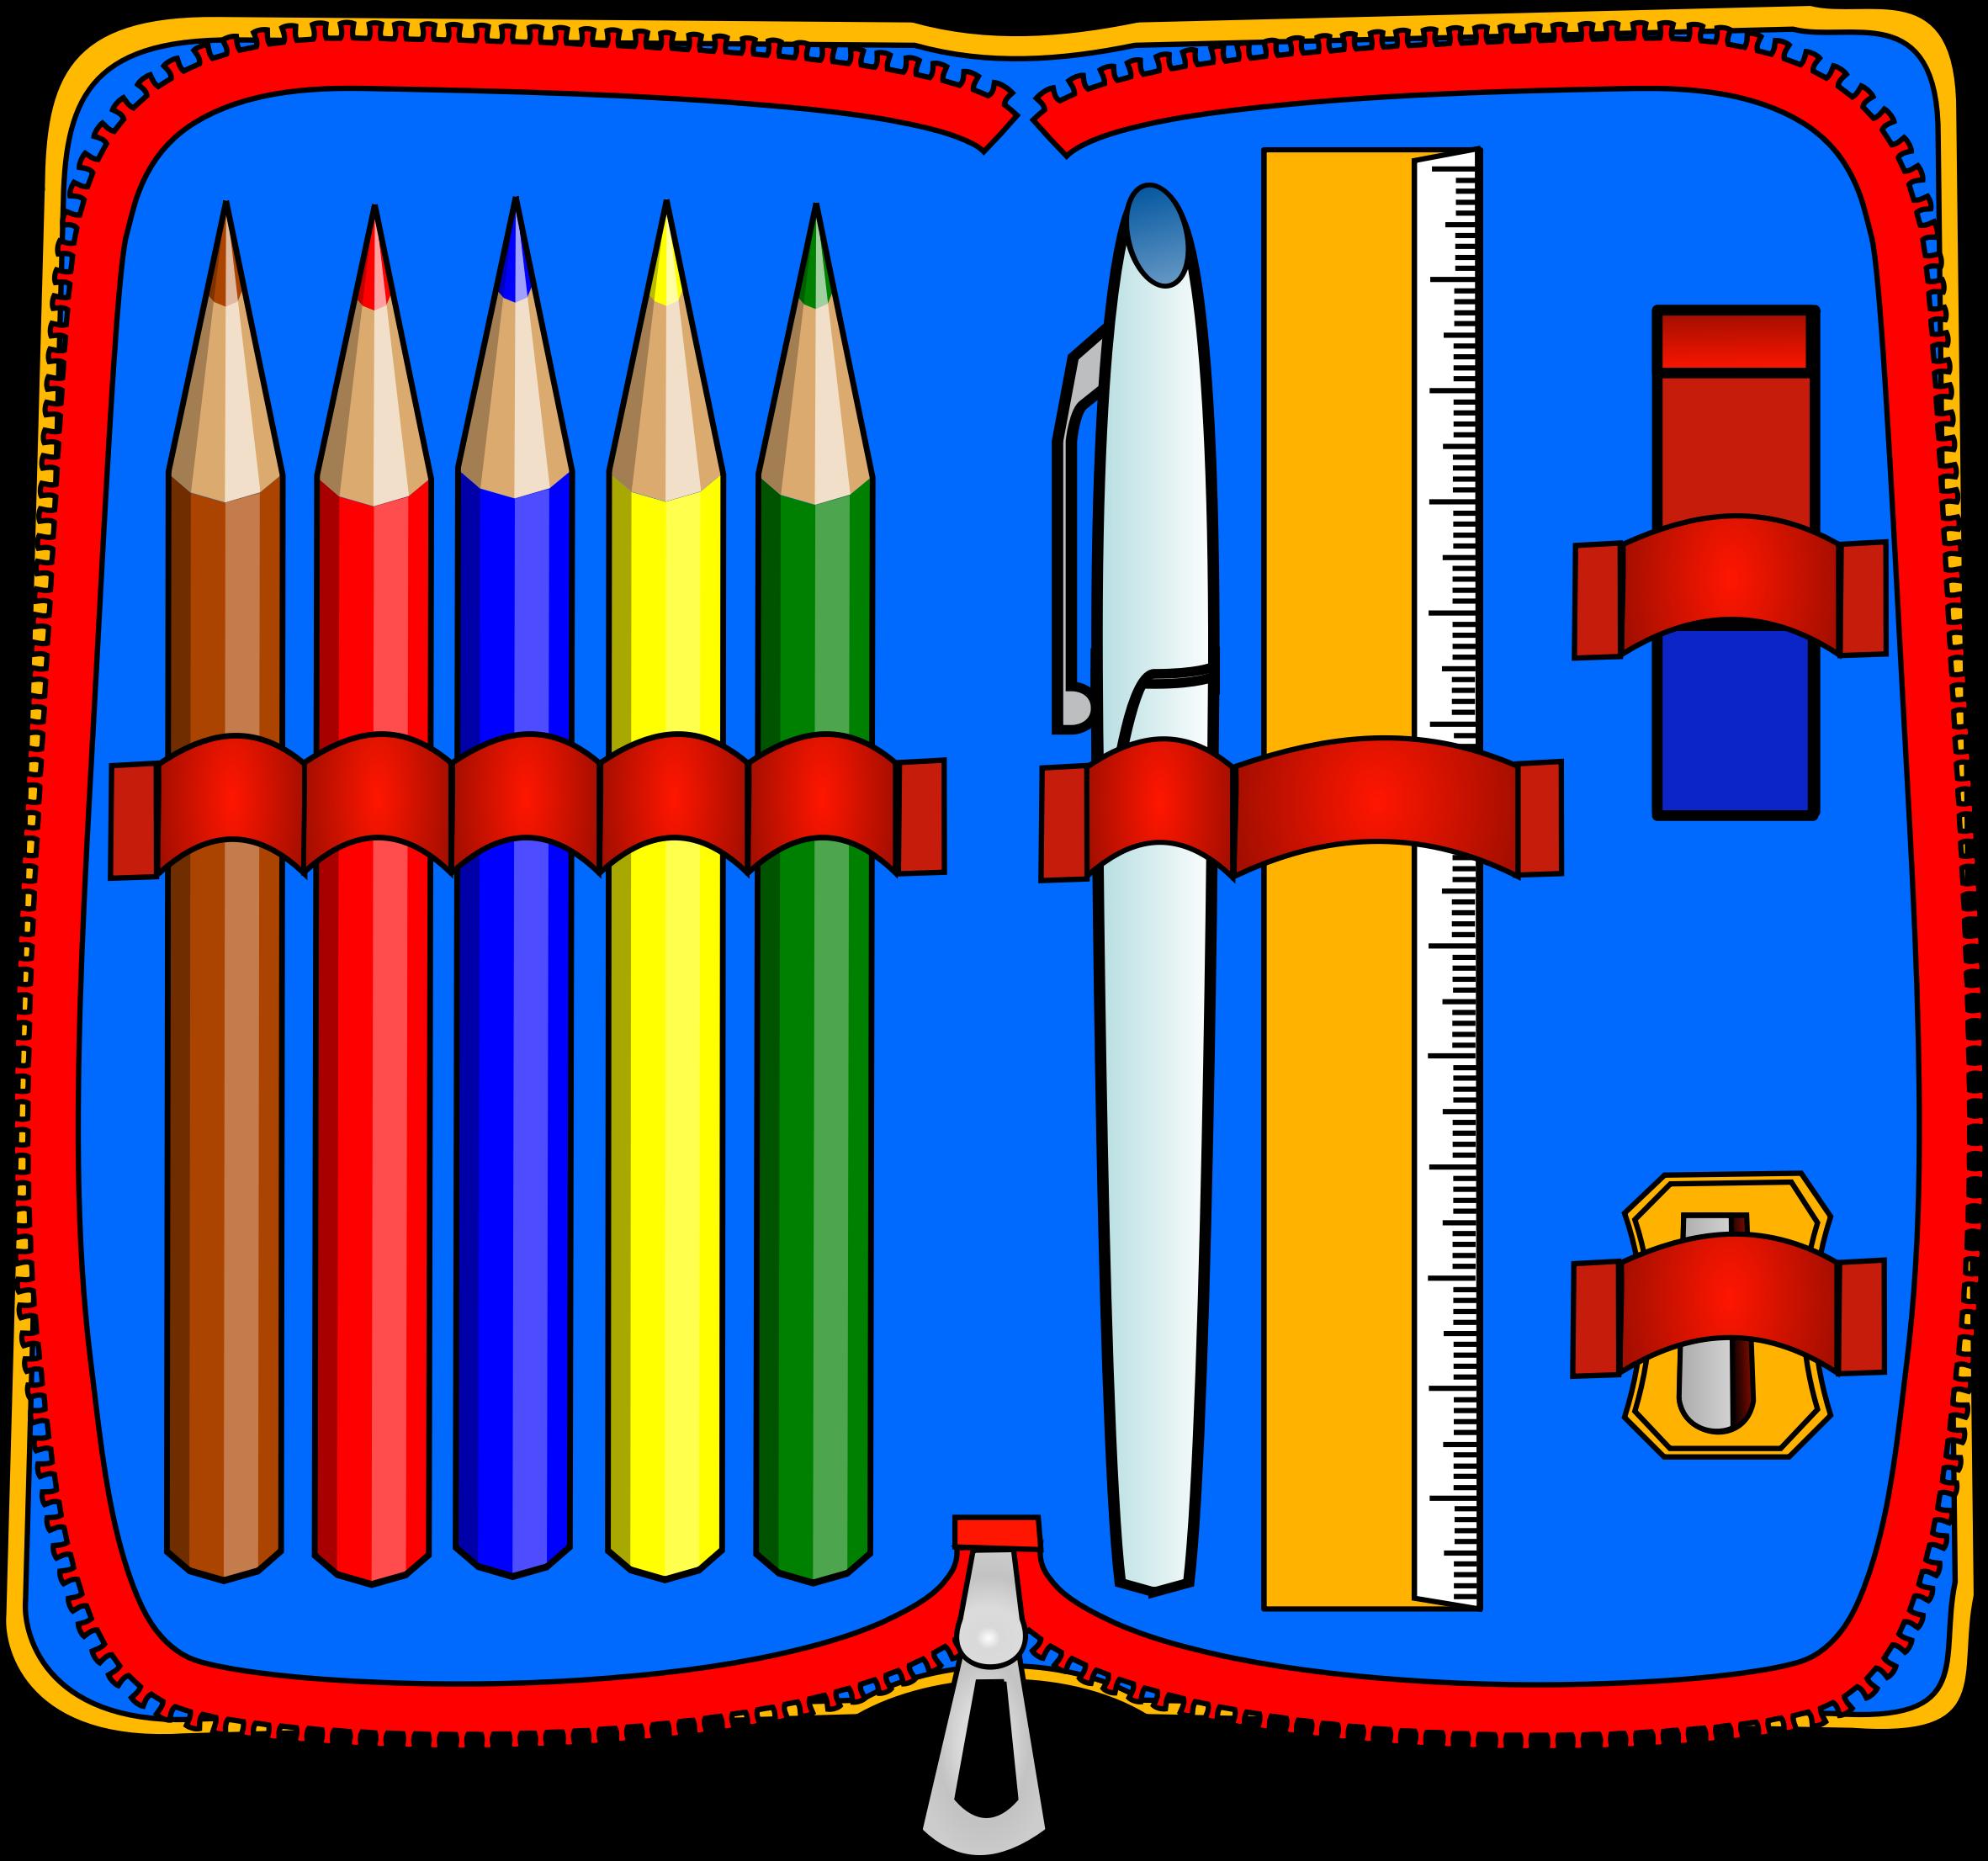 Case clipart graphic Pencil case clipart free - ClipartFest graphic